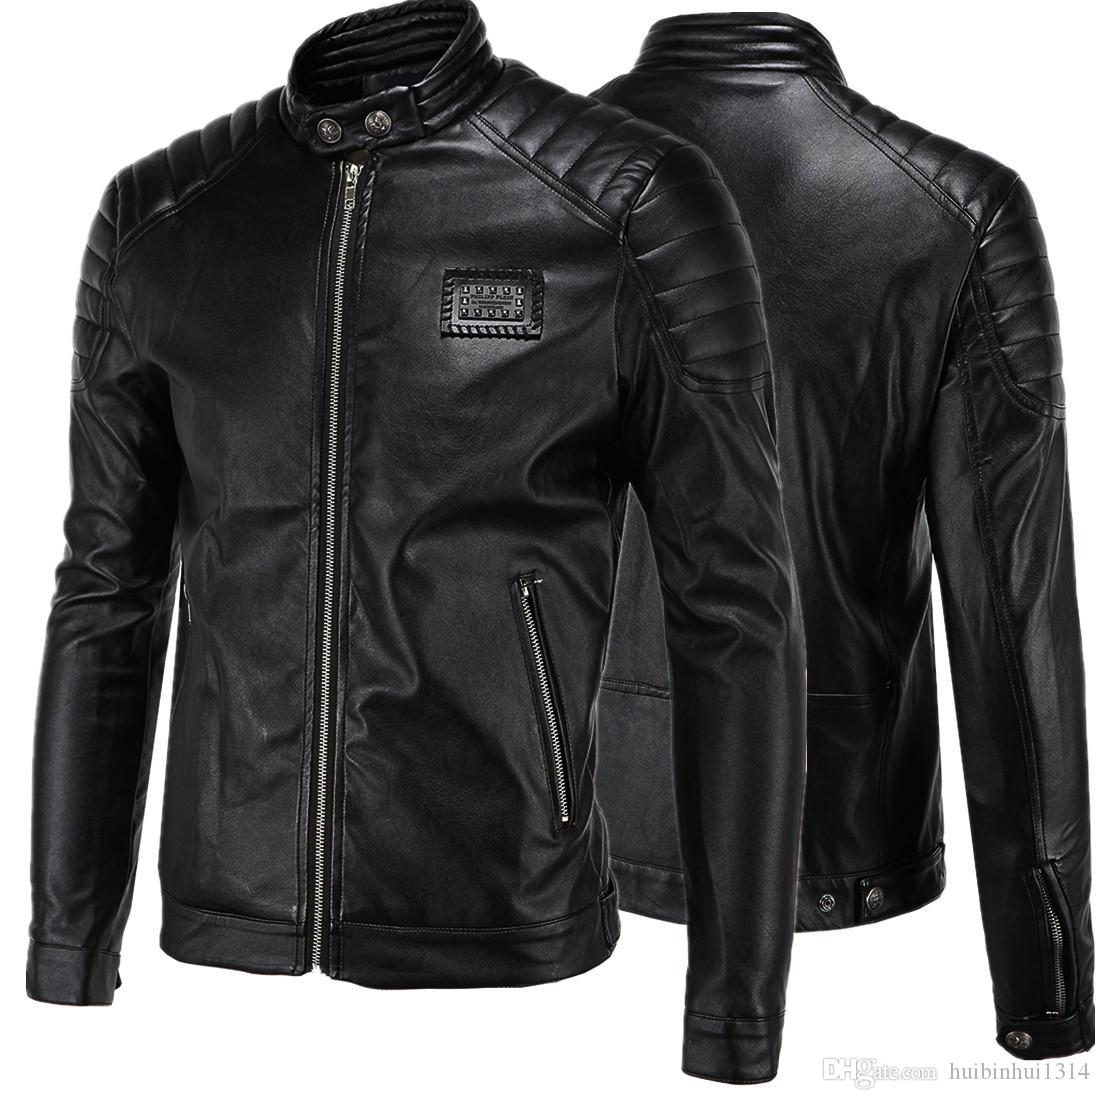 Cheap leather biker jackets